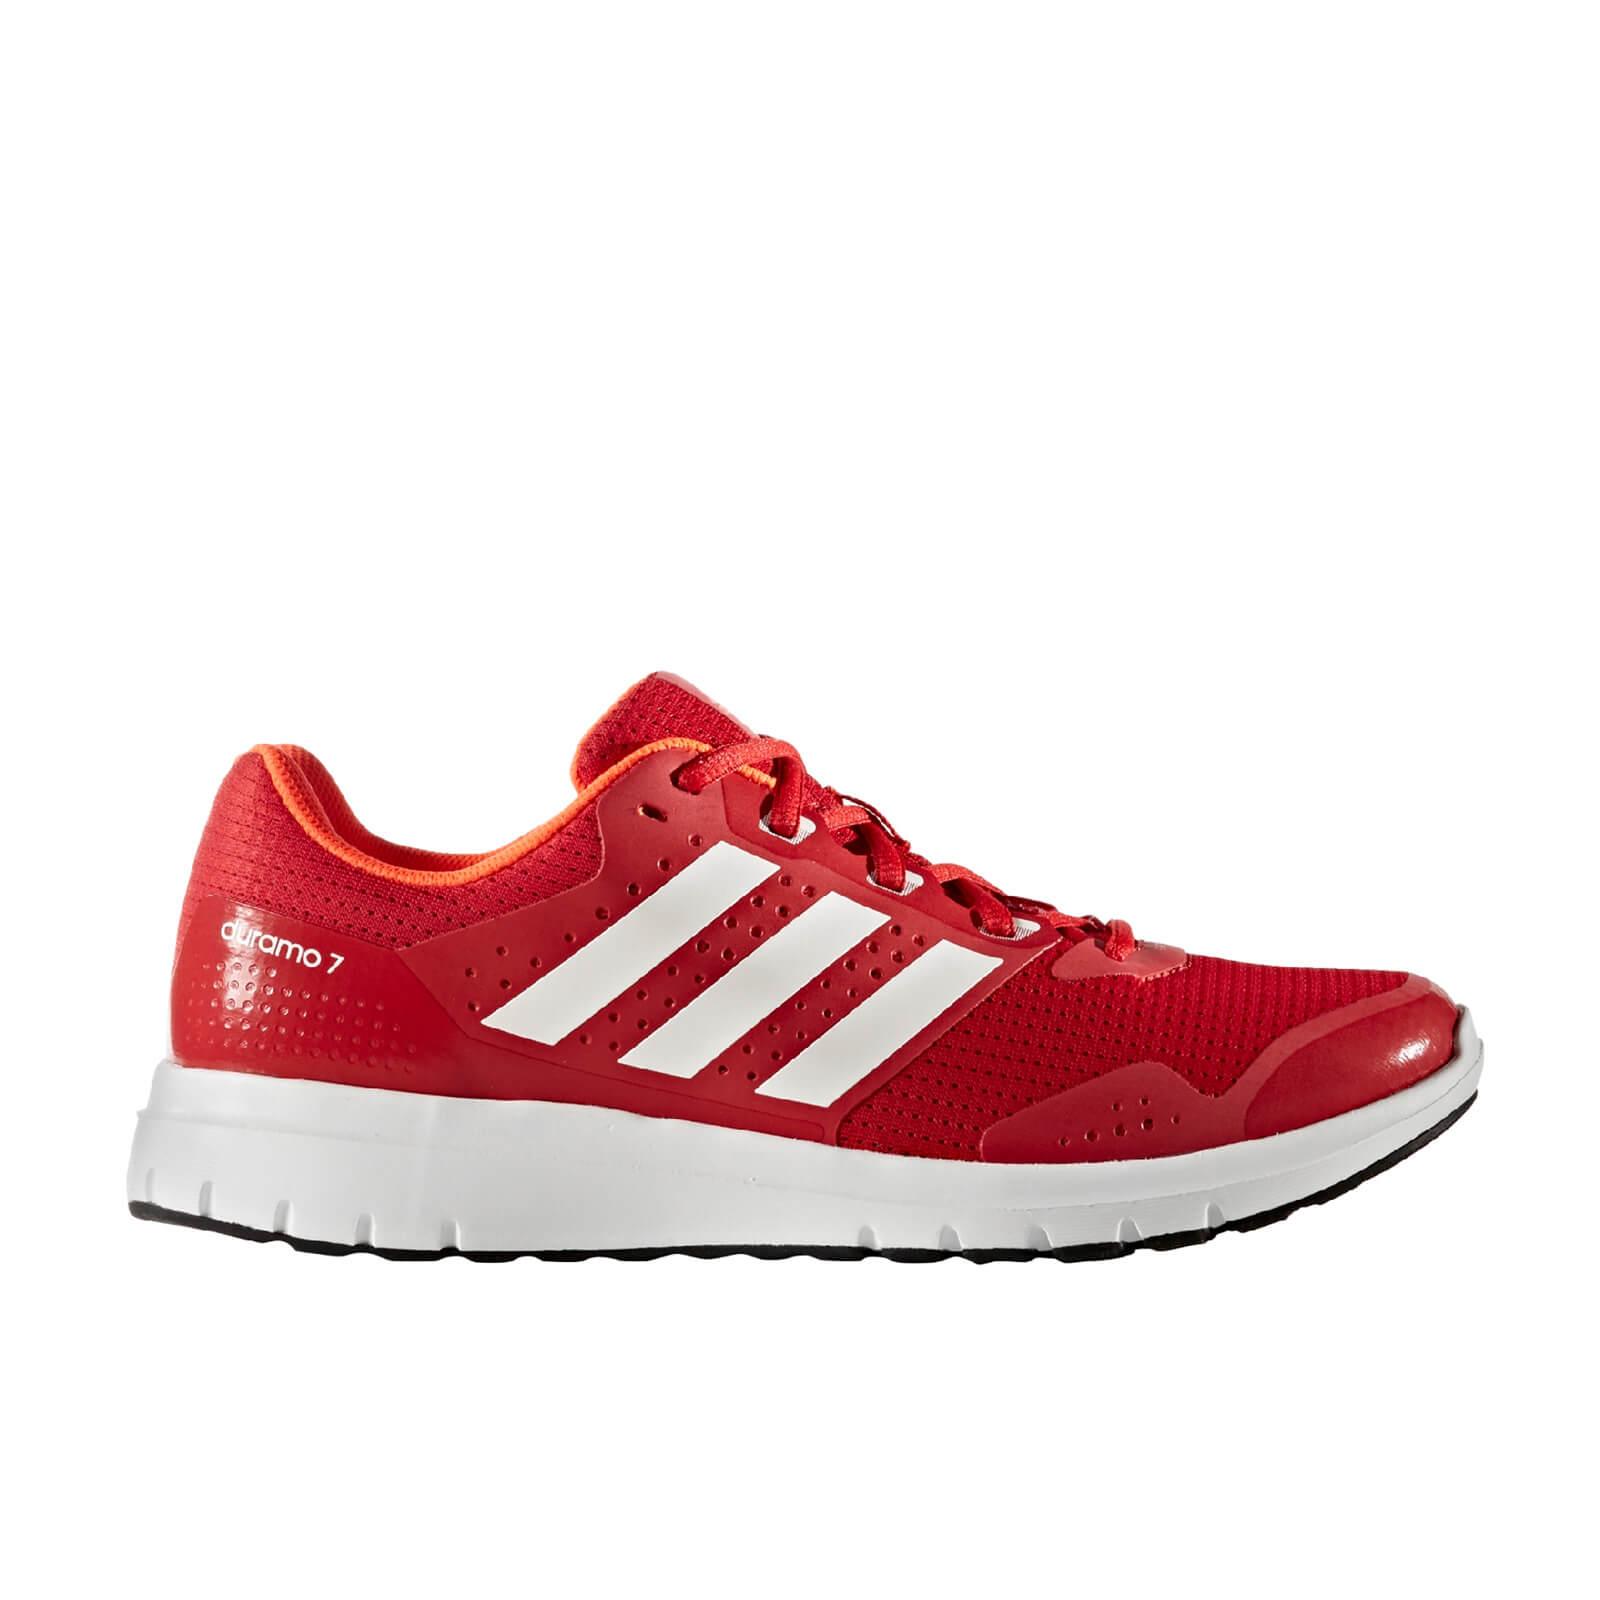 adidas duramo 7 running shoes 275d4c